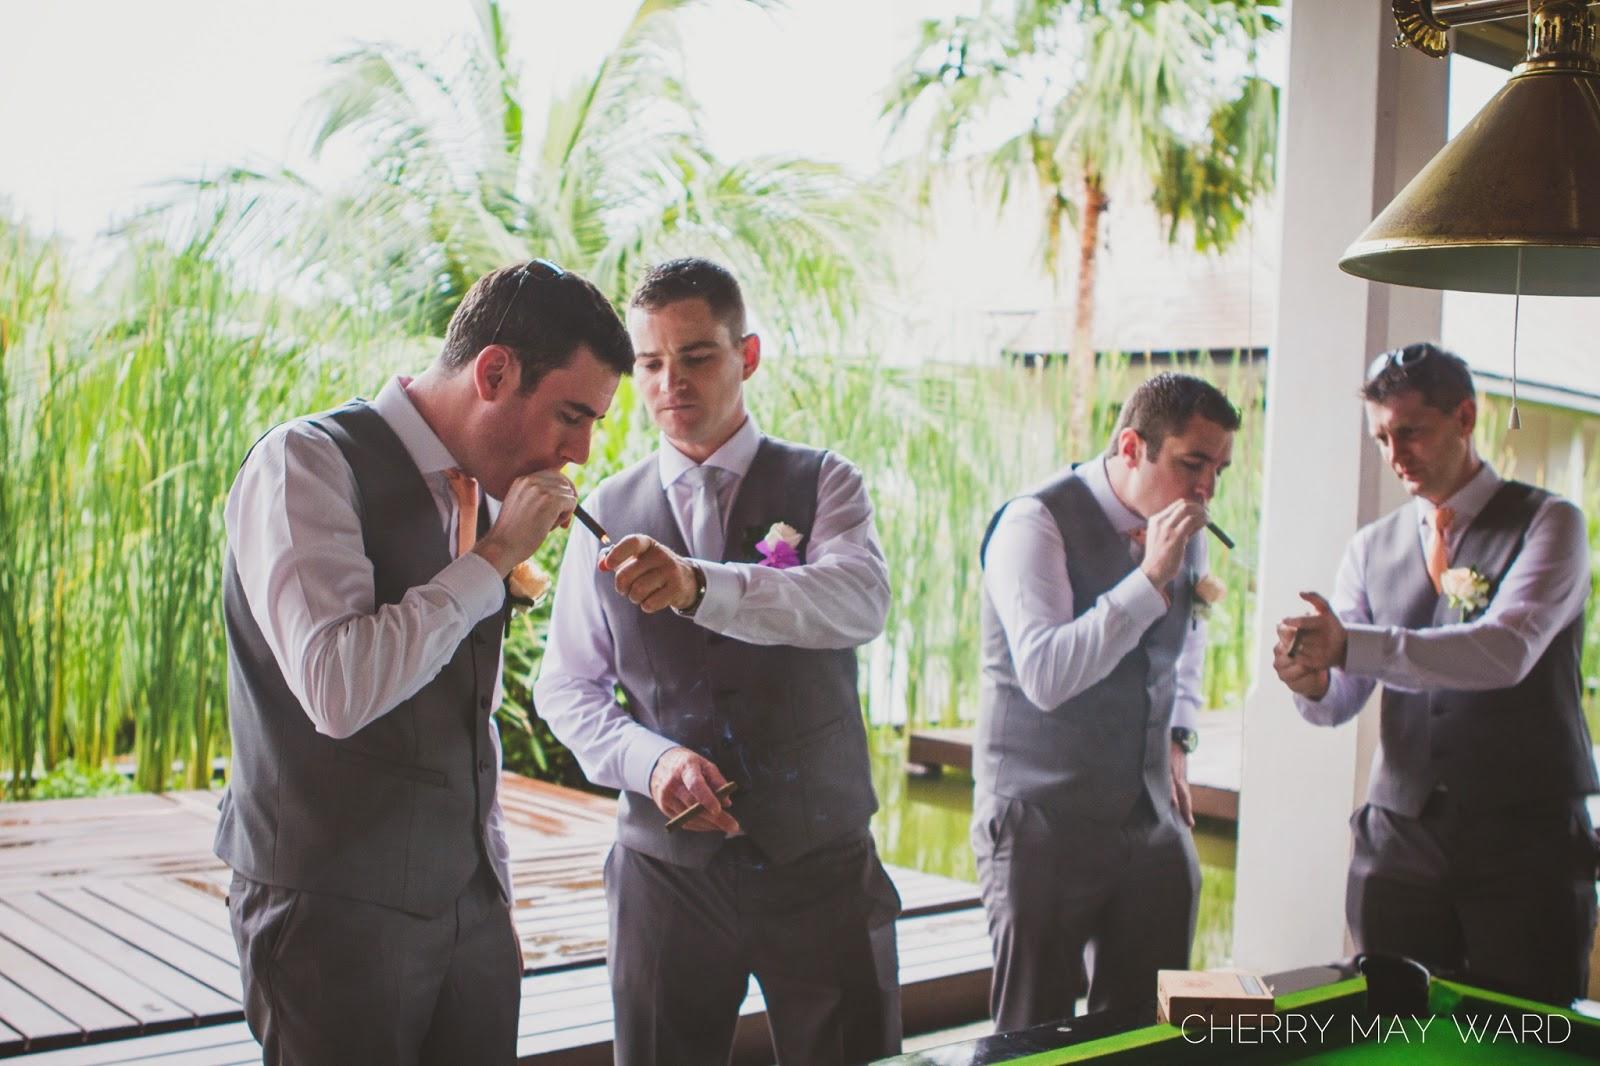 Koh Samui mens wedding portraits, cigars, men with cigars, lighting cigars, Thailand wedding with cigars, Koh Samui wedding photographer